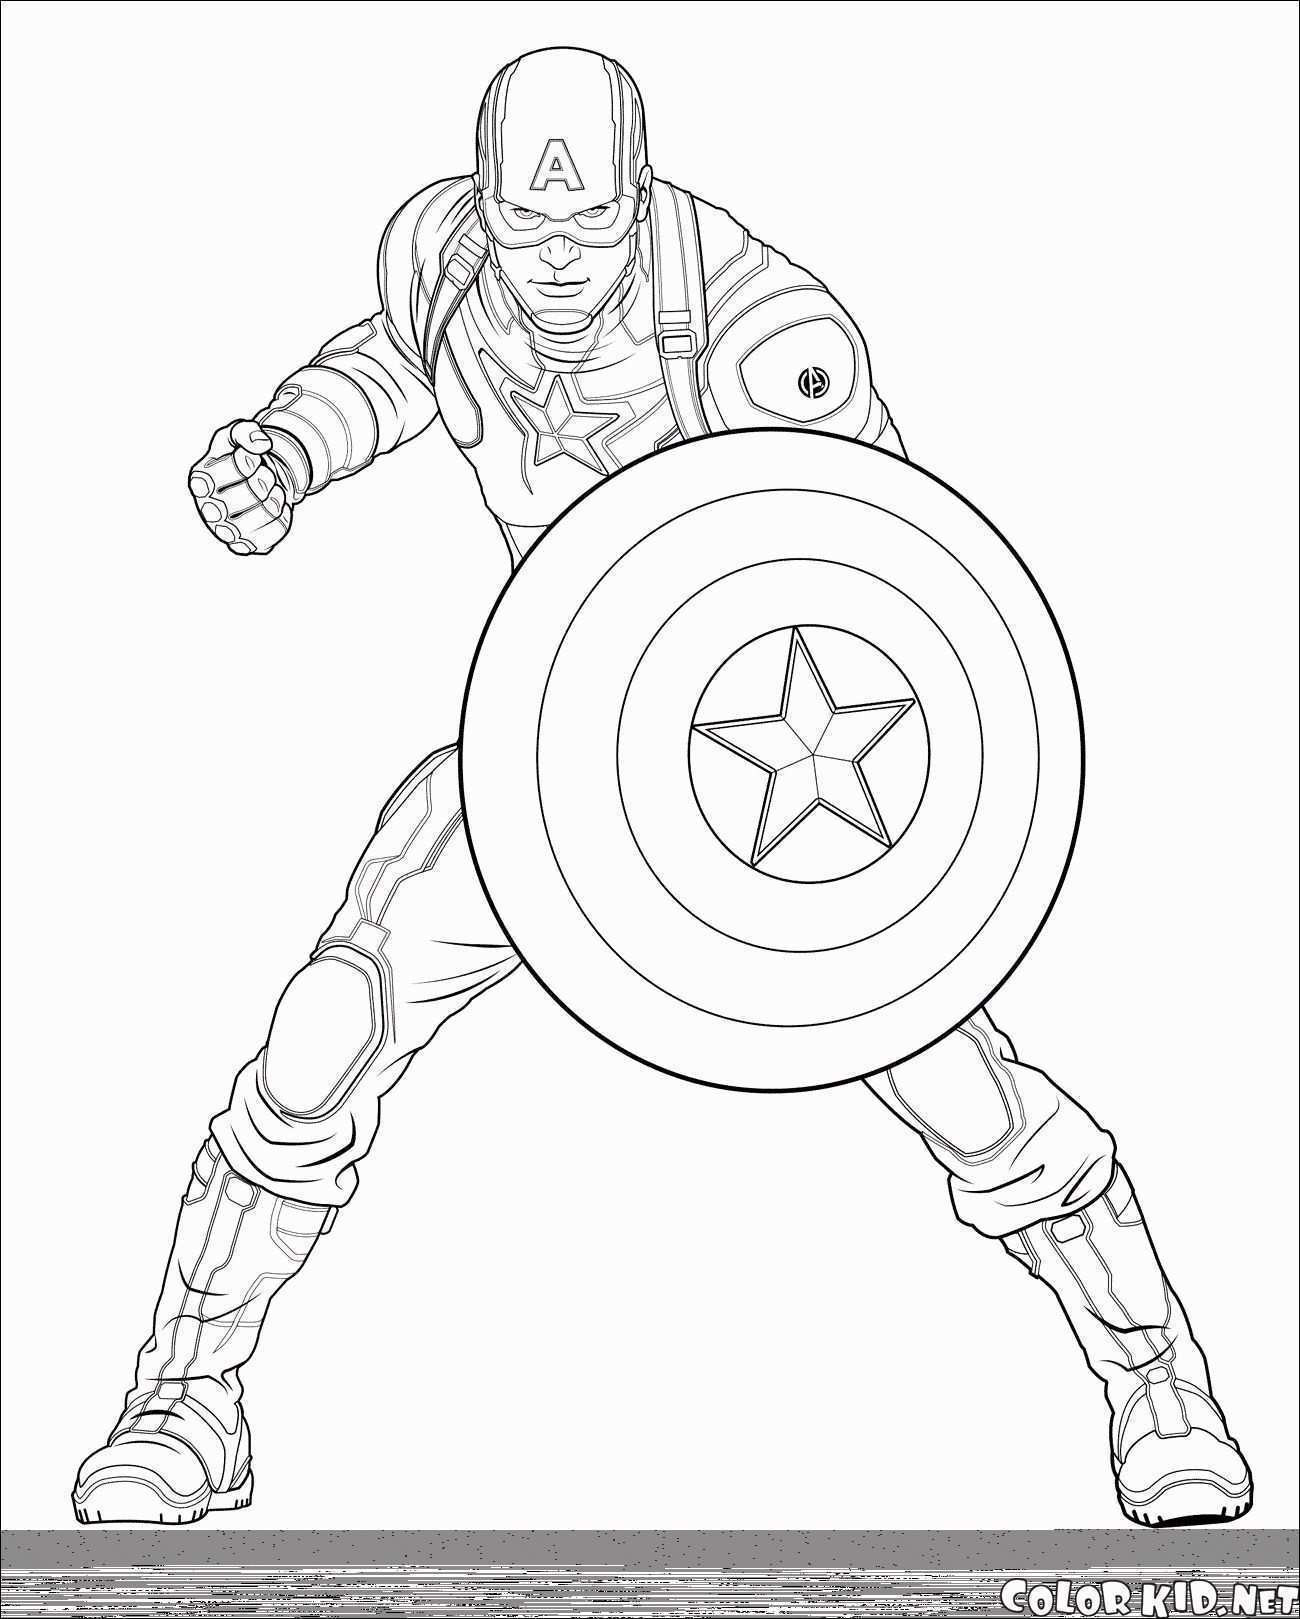 Ausmalbilder Marvel  Ausmalbilder Marvel Super Heroes Bild – Ausmalbilder Ideen